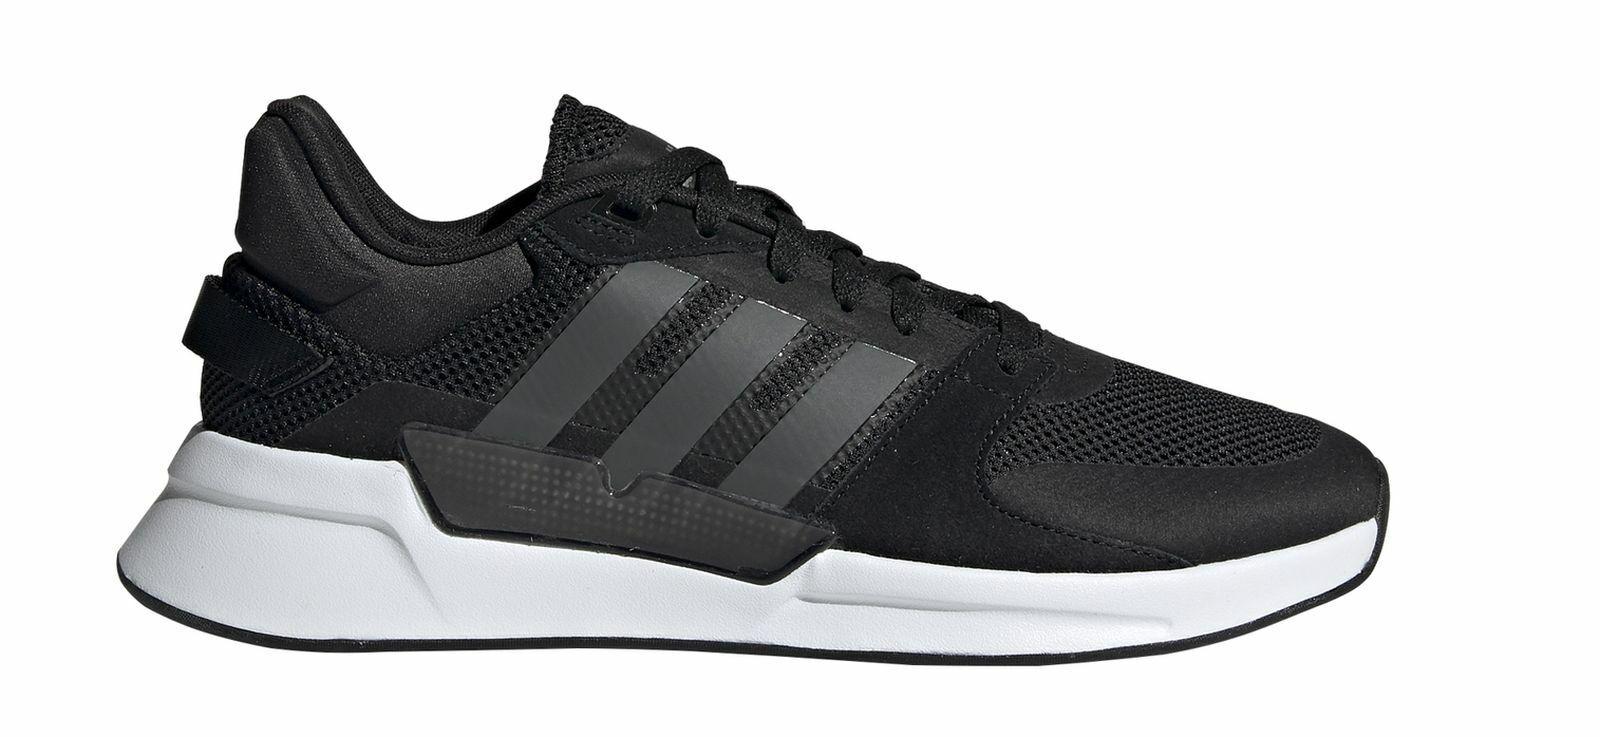 Adidas Performance Herren Freizeit Fitness Turnschuhe Schuhe RUN90S schwarz